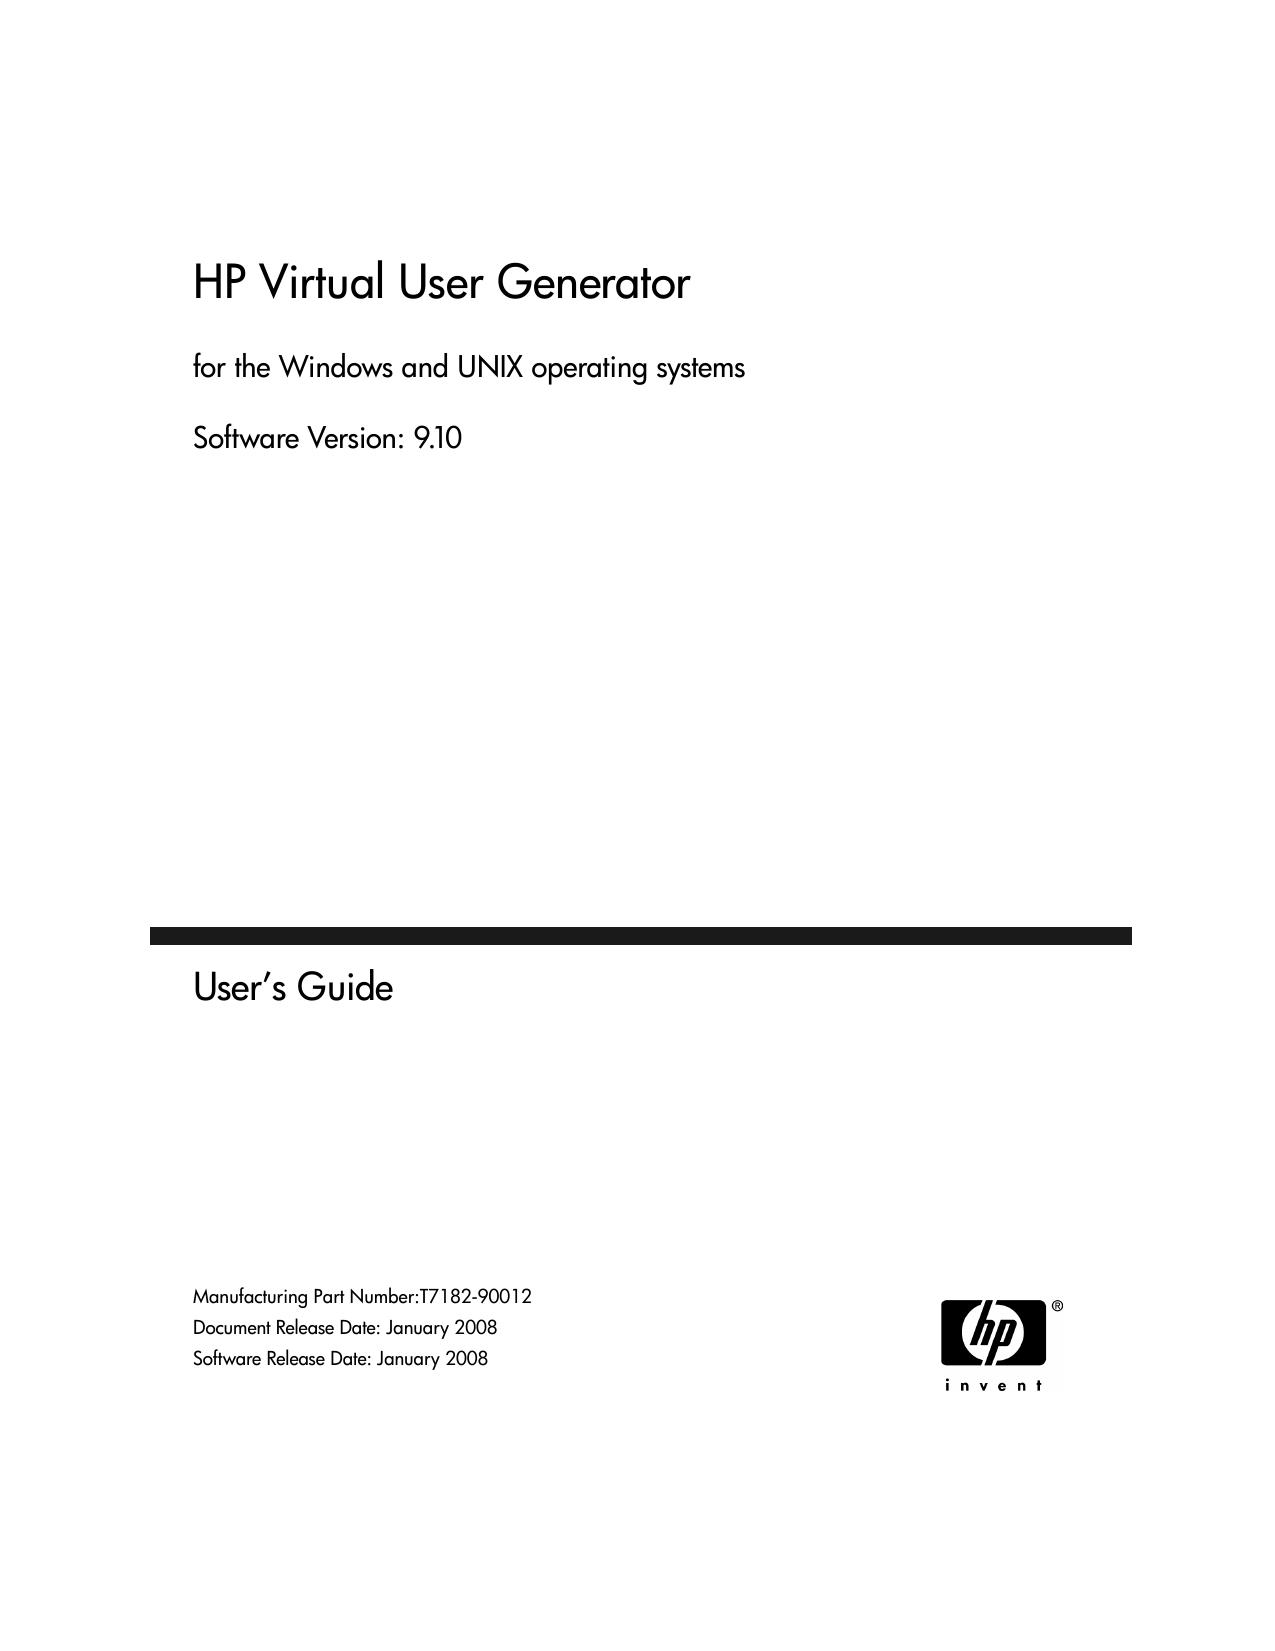 HP Virtual User Generator User`s Guide - Login | manualzz com